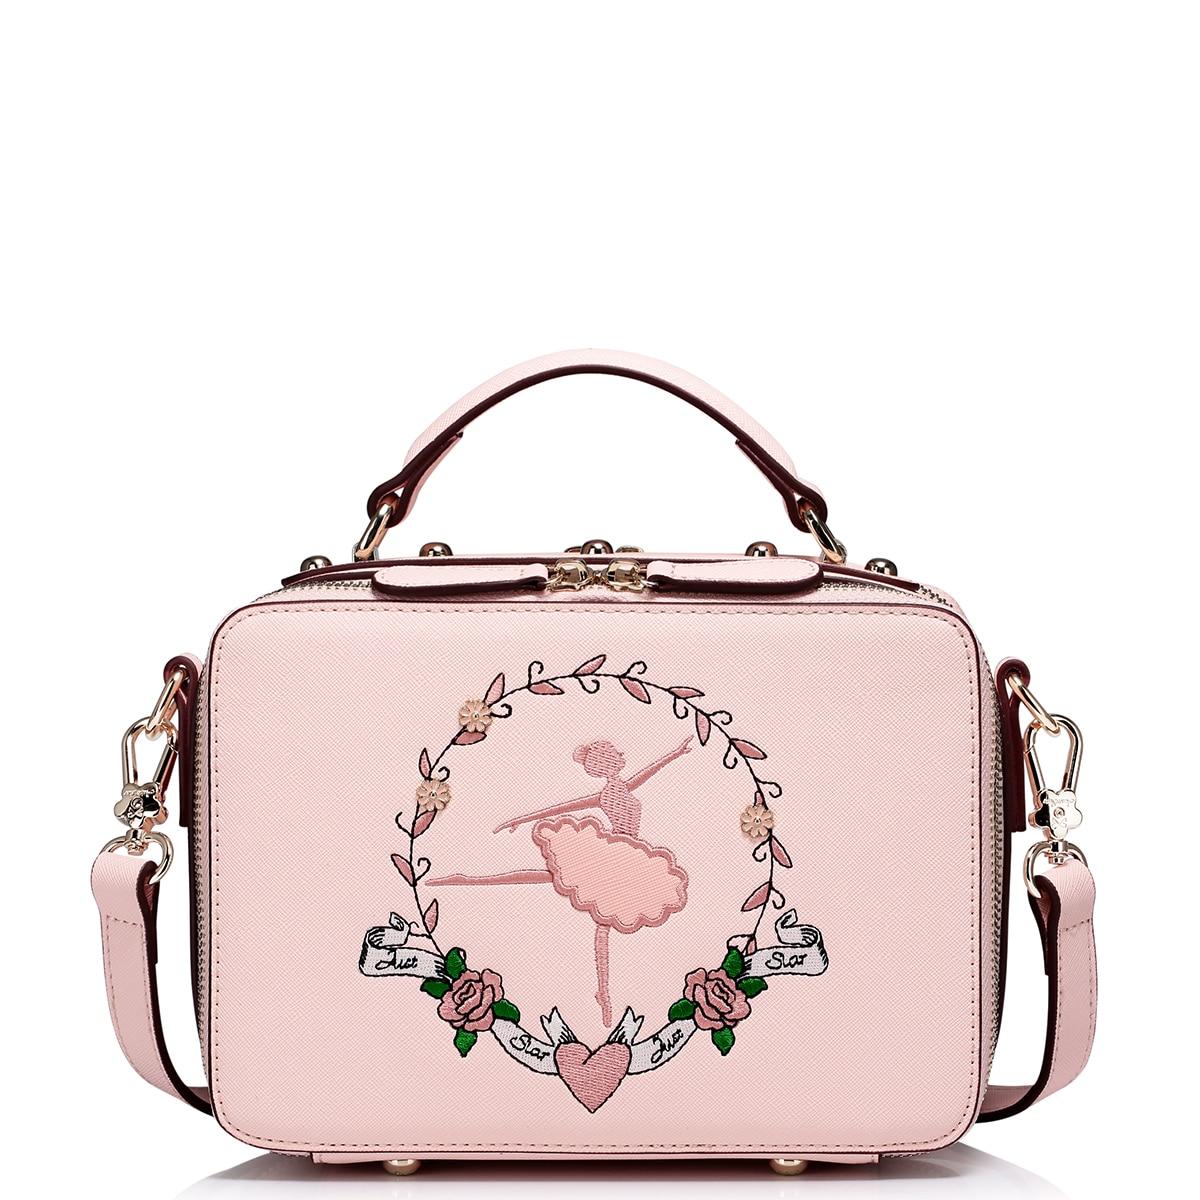 2017 verão flor ballet menina Handbag Estilo : Top Handle Bag Shoulder Bag Messenger Bag Clutch Bag Crossbody Bag